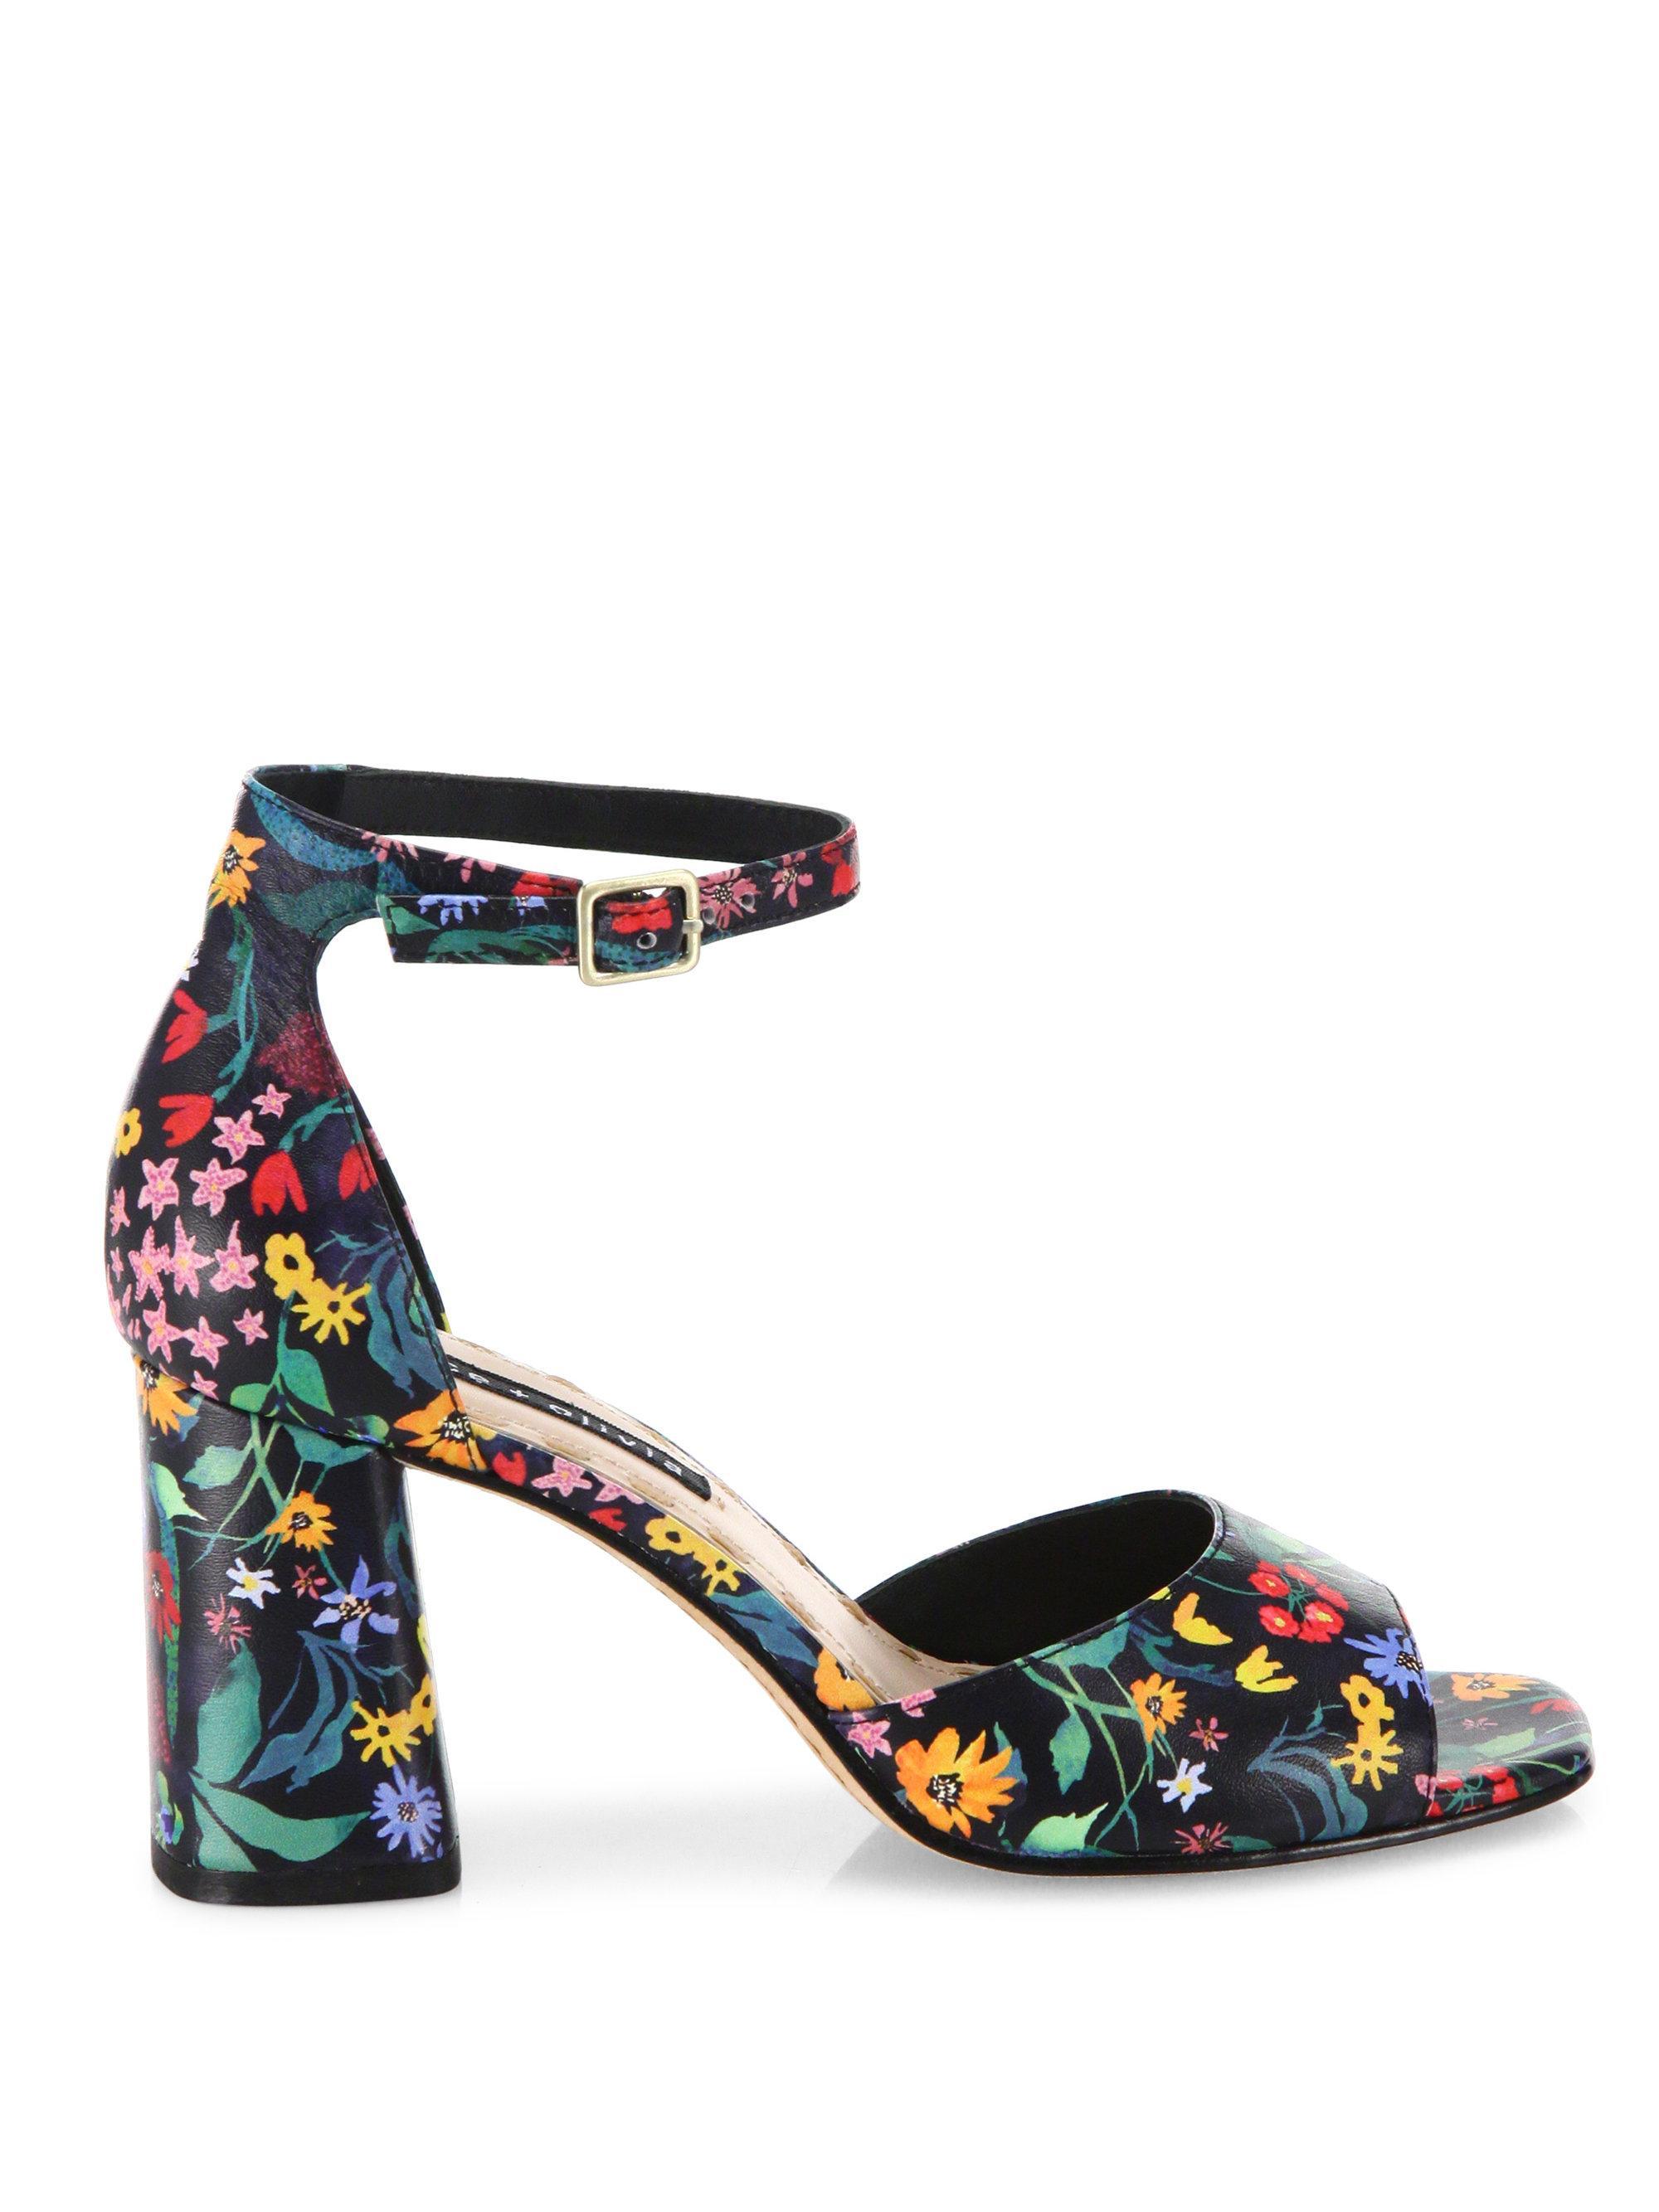 930571c26 Lyst - Alice + Olivia Cooper Floral Leather Block Heel Sandals in Black